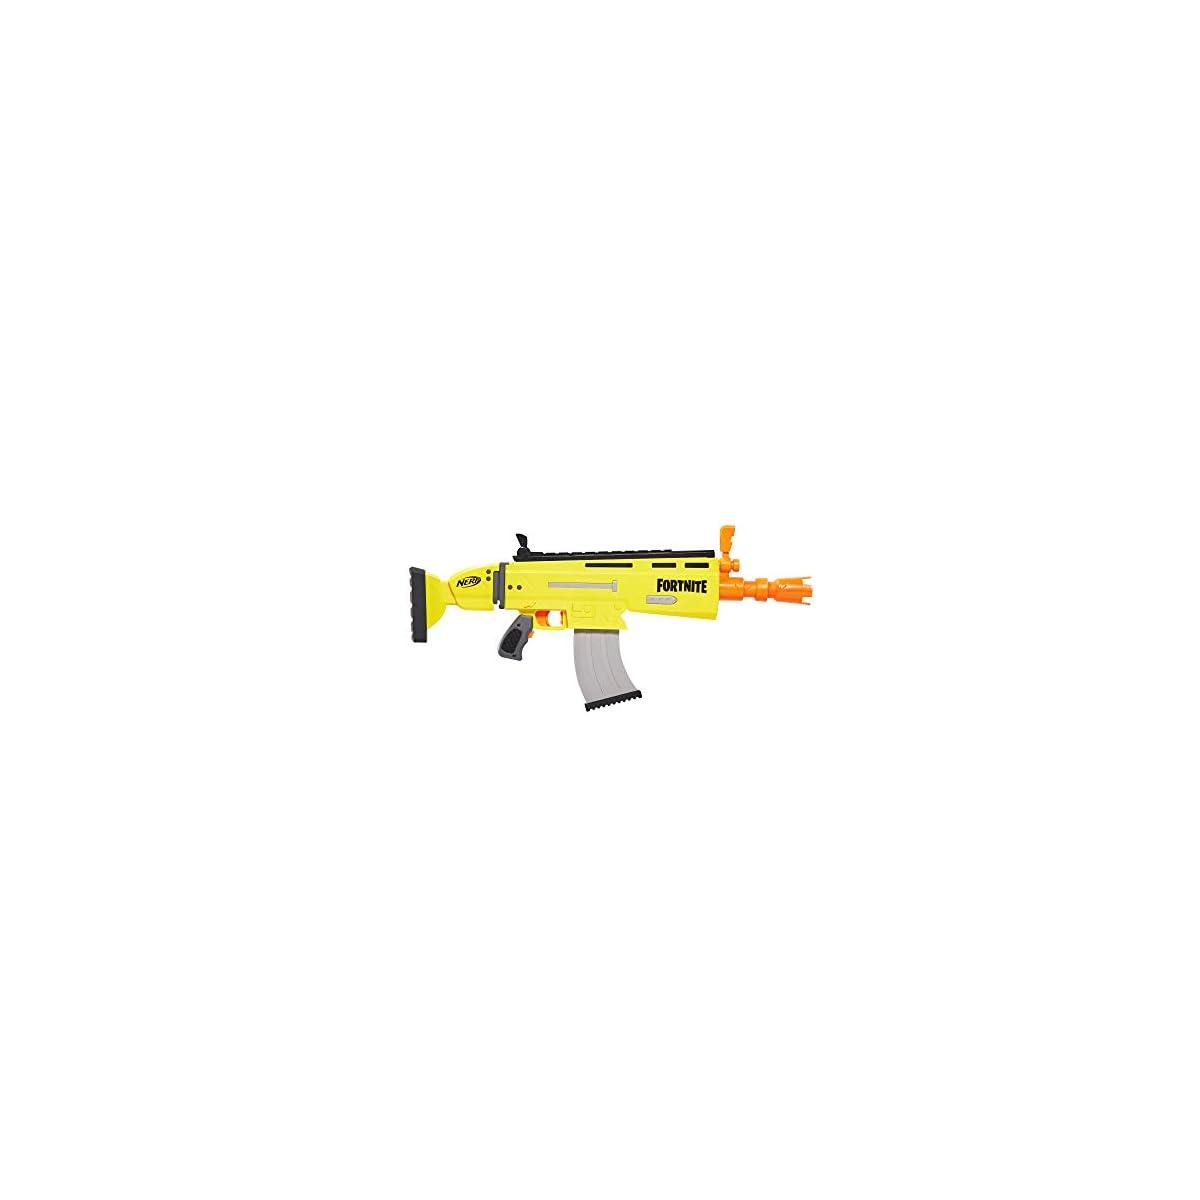 SaleProductsOffer - No.1 Best Online Store 31n0mlMgItL NERF Fortnite AR-L Elite Dart Blaster